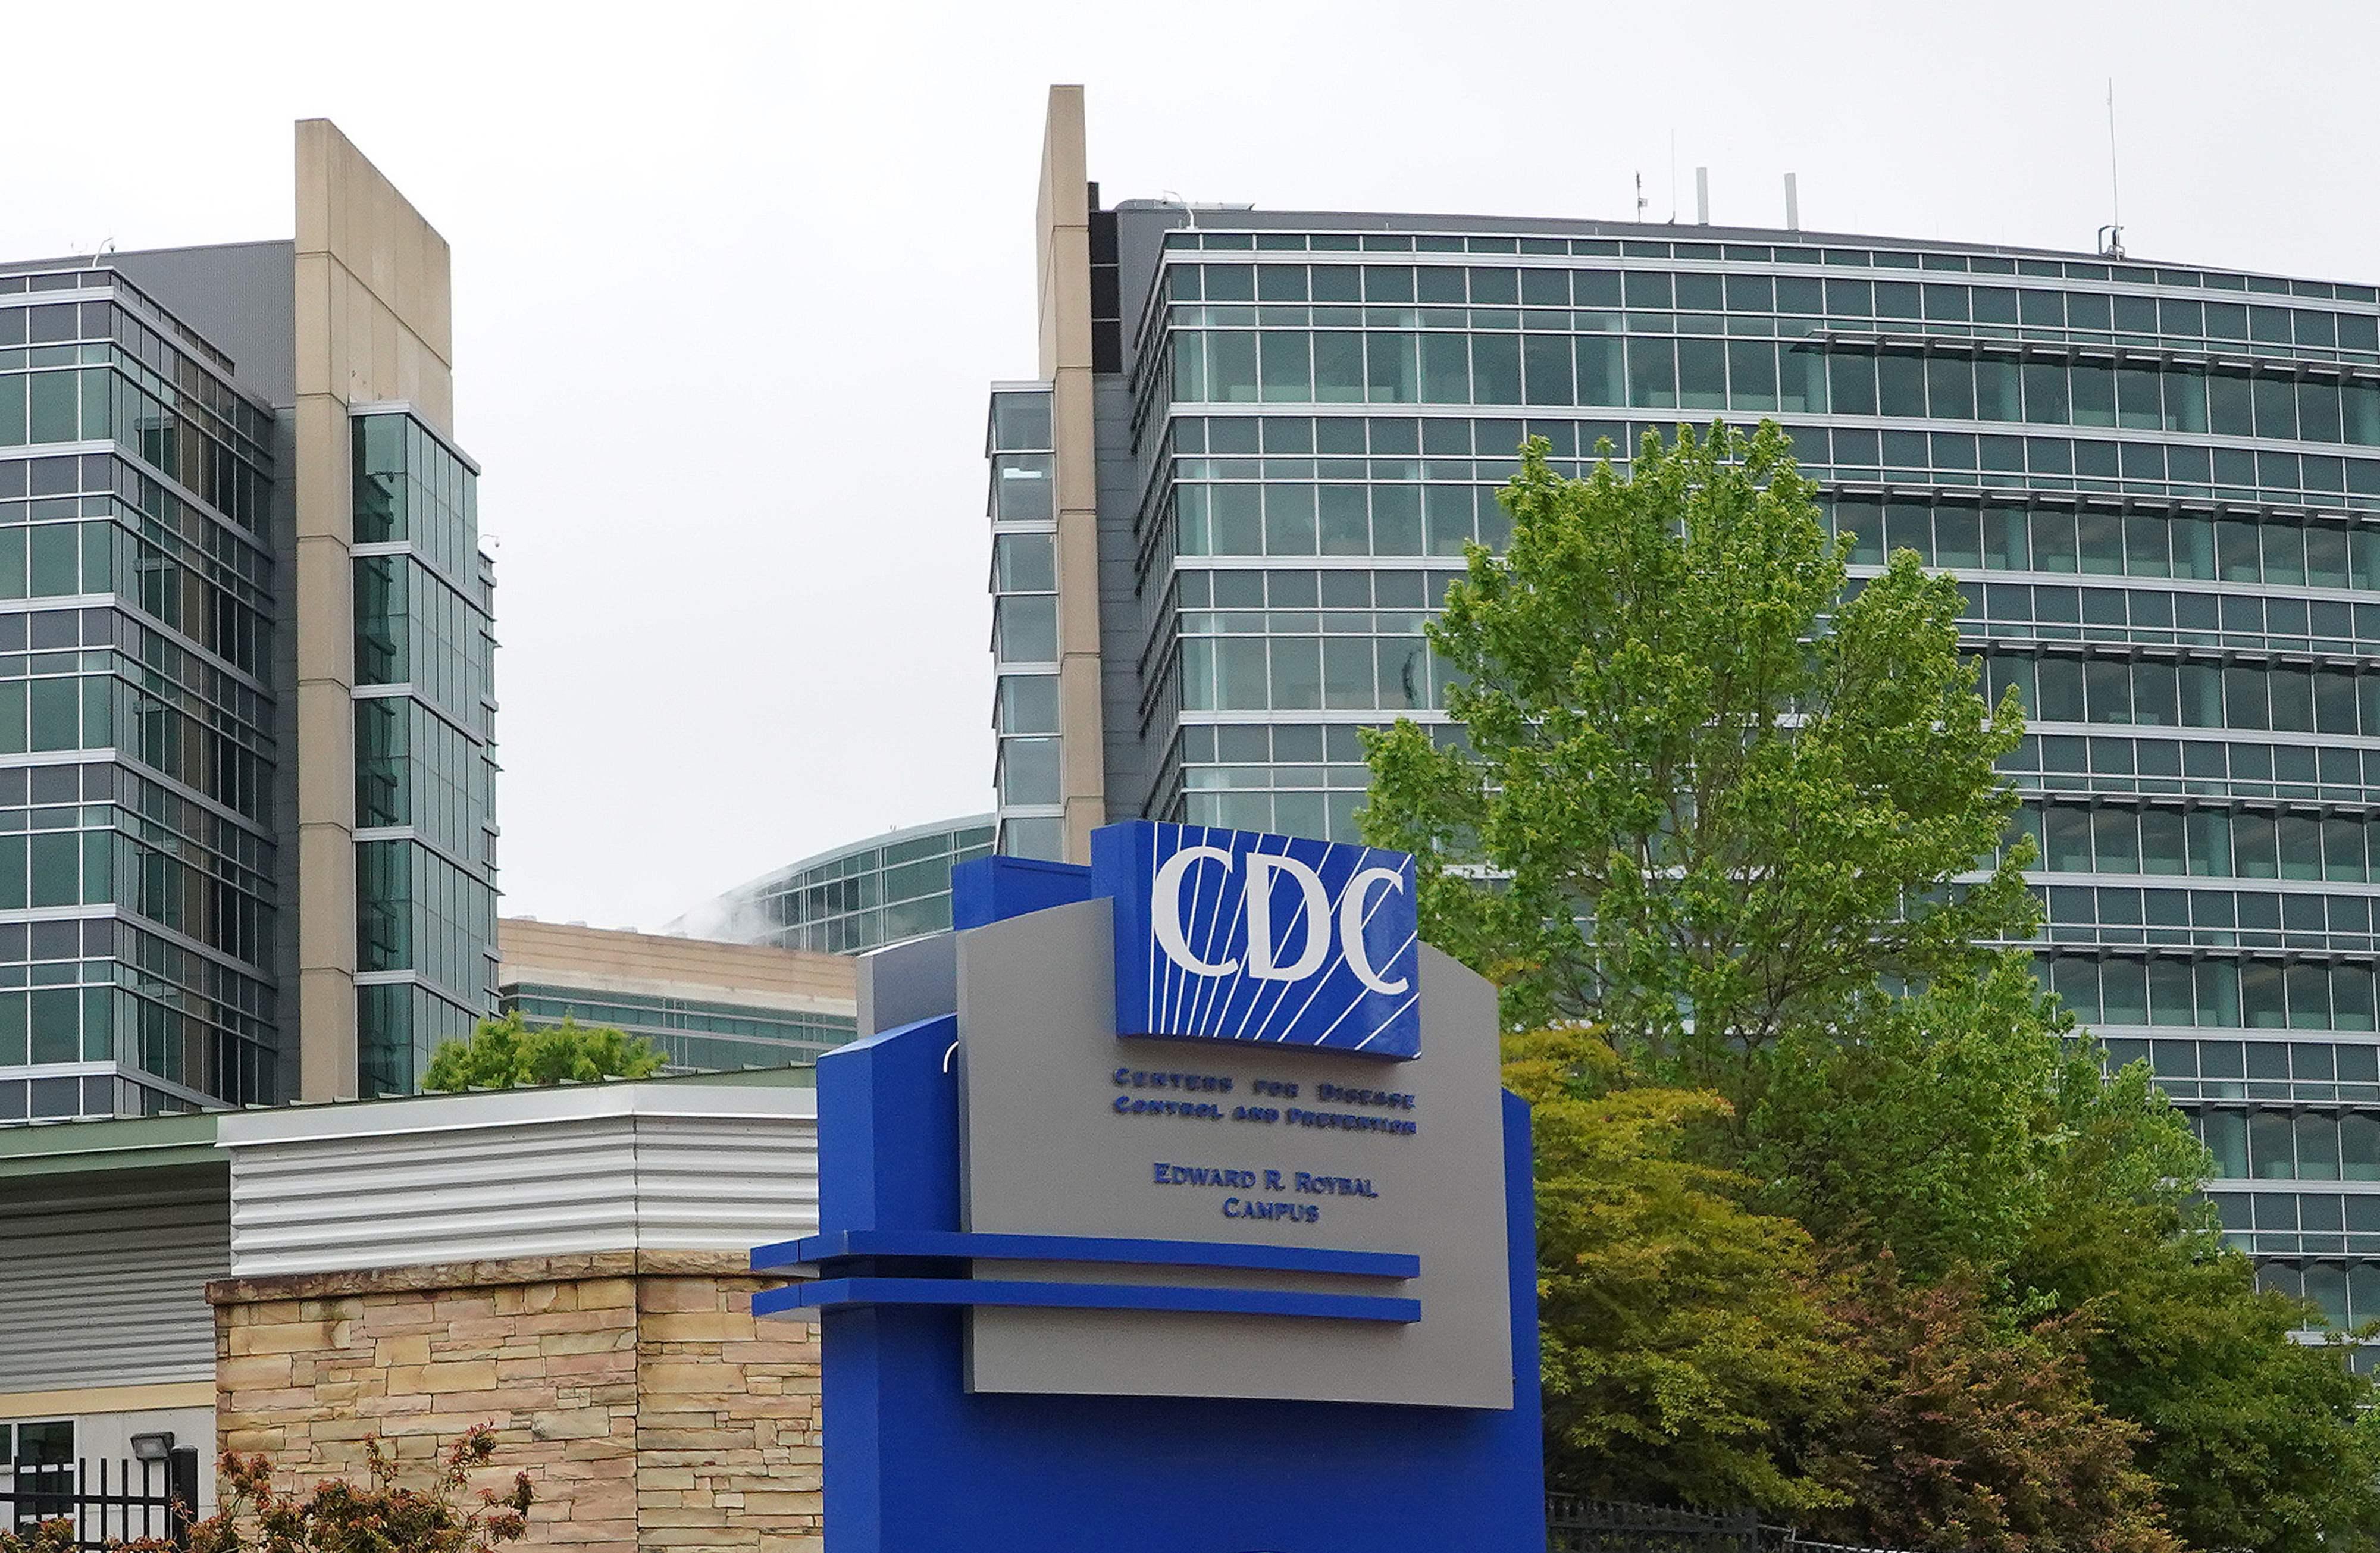 Listeria outbreak linked to Italian-style deli meats kills 1, hospitalizes 9 across 3 states, CDC says